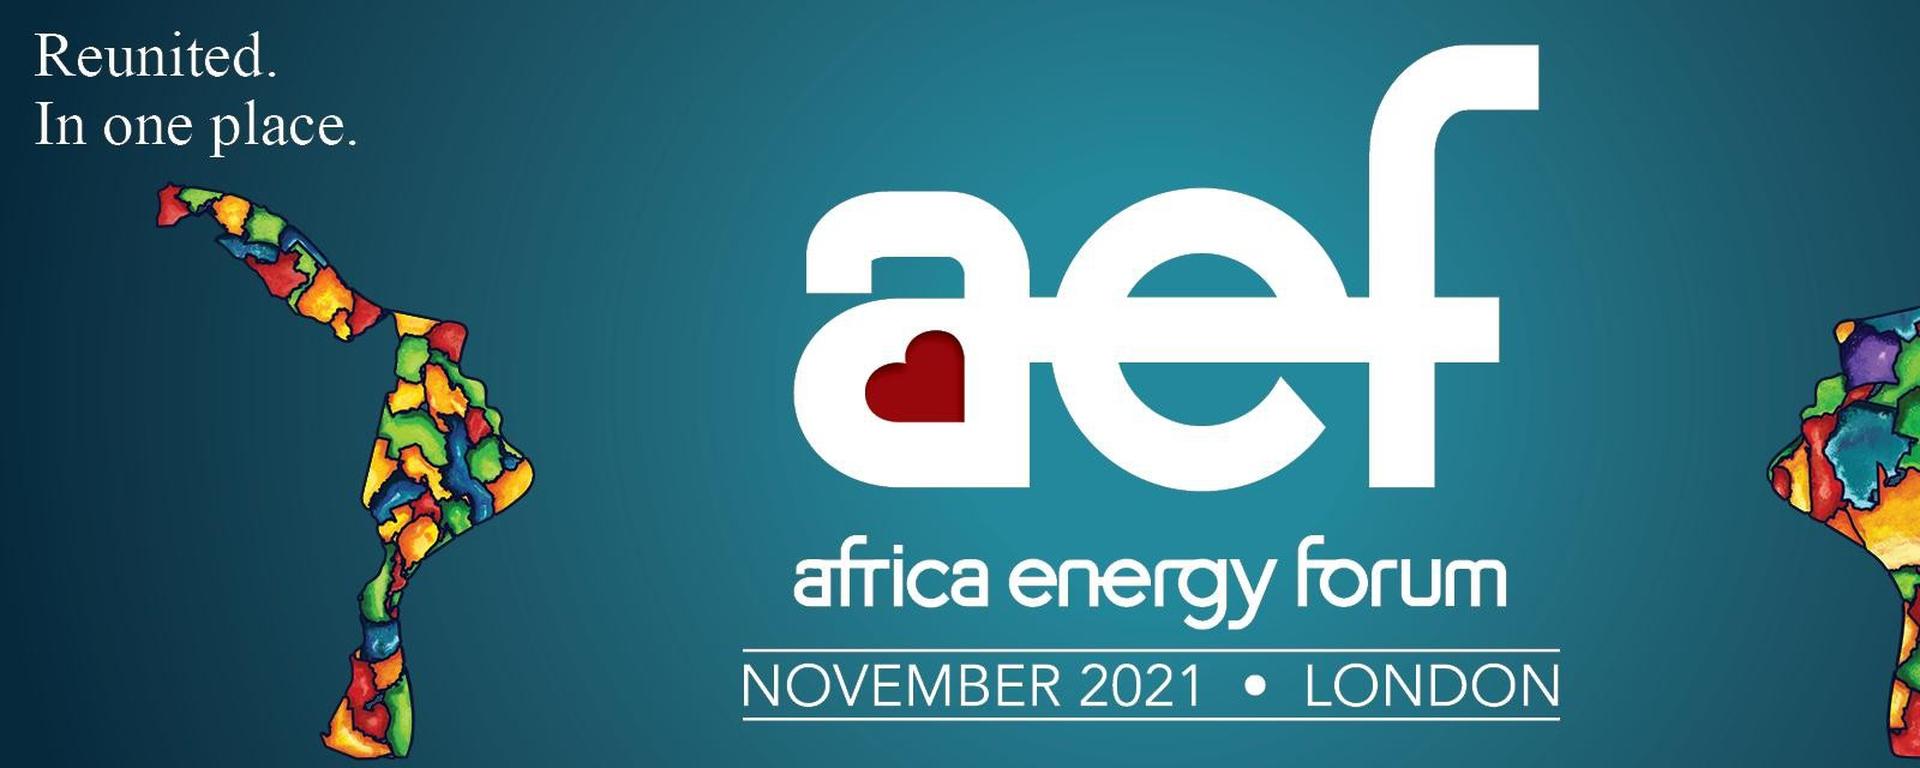 Energynet Africa - Africa  Energy Forum 2021 Movemeback African event cover image